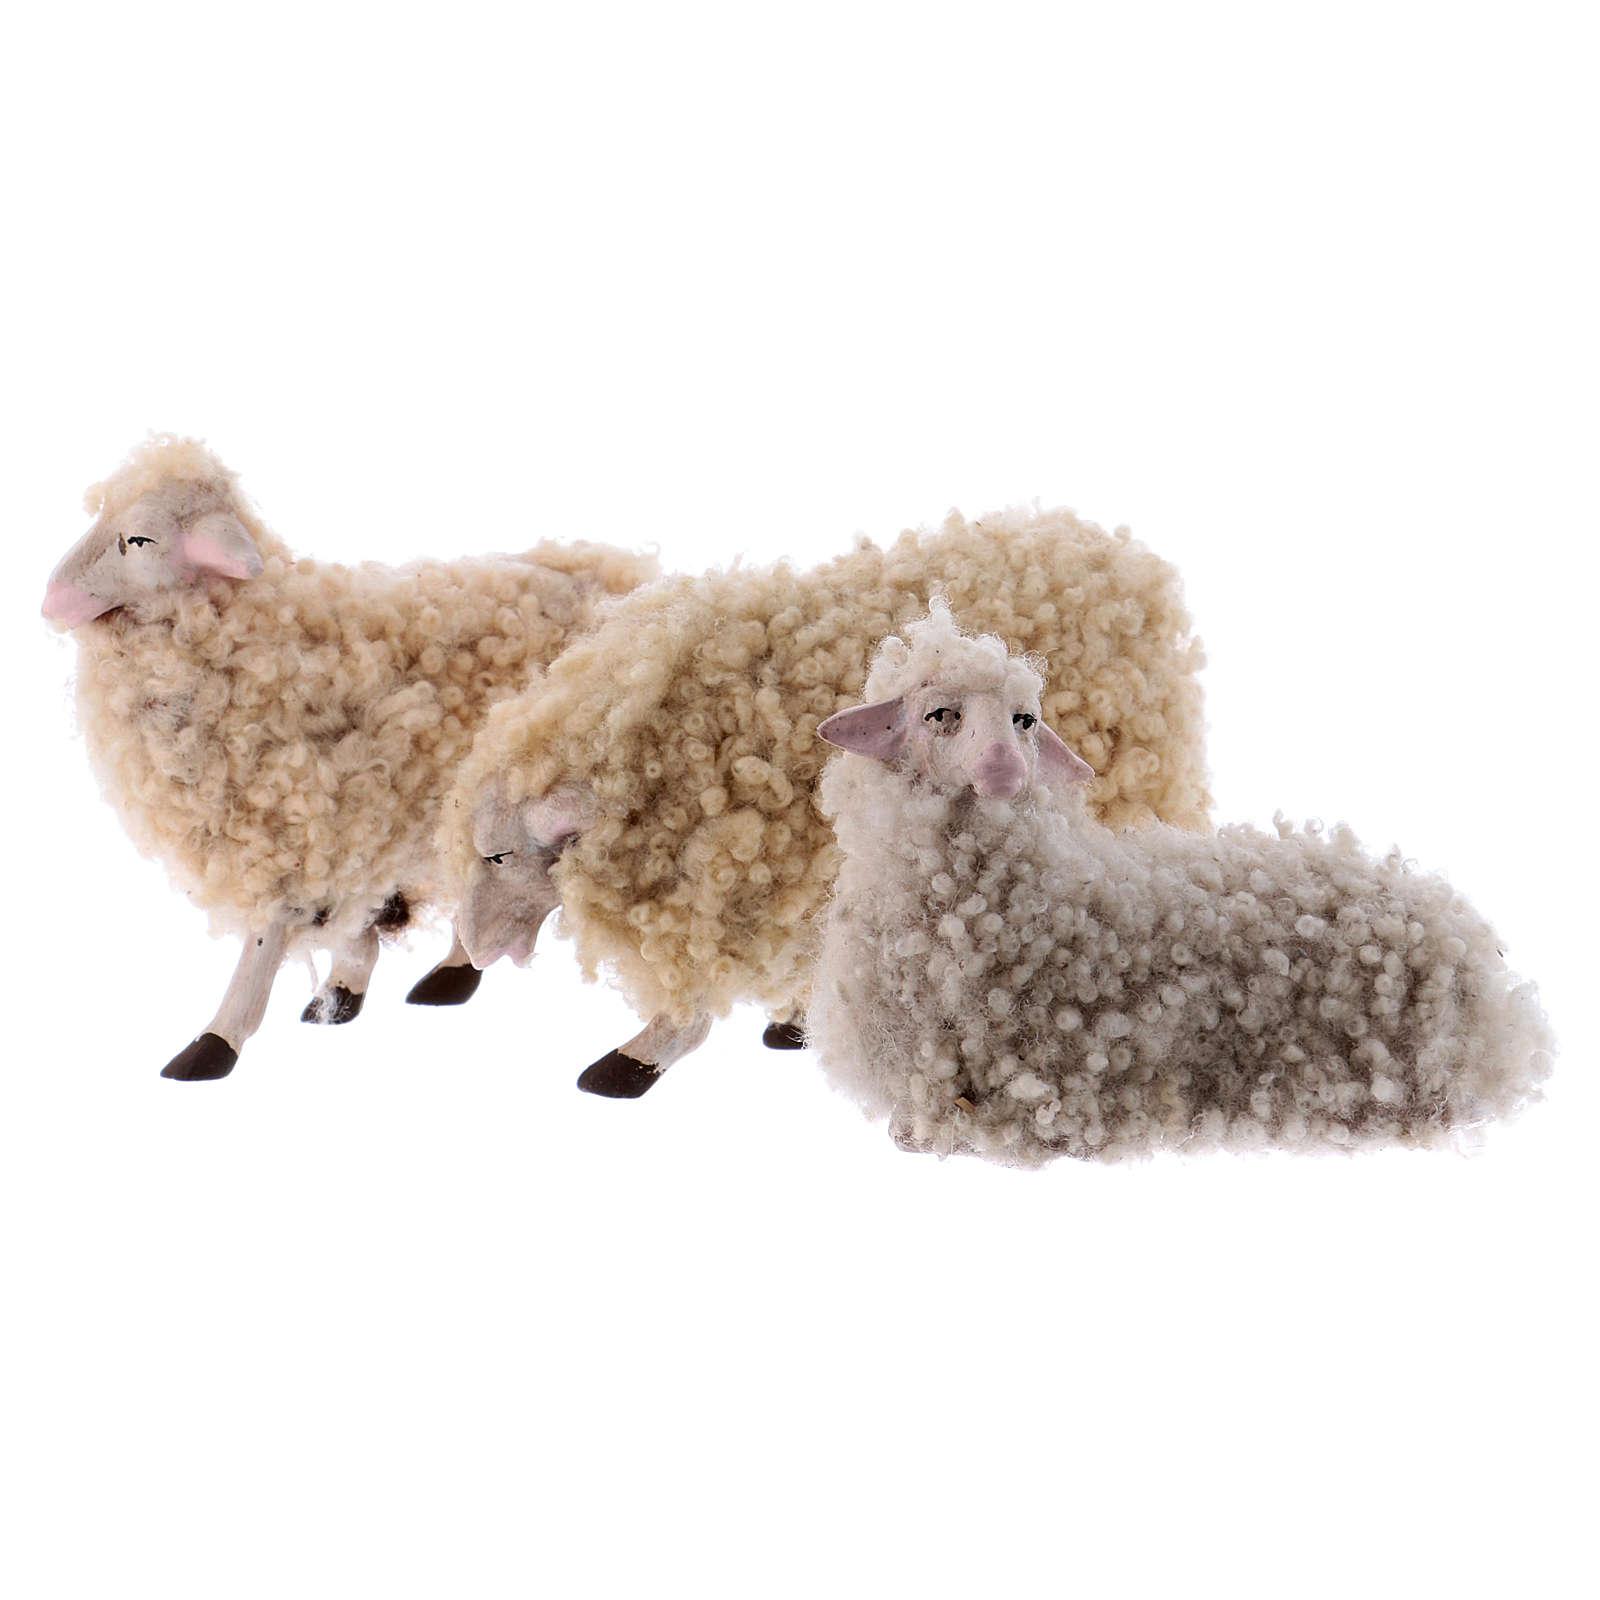 Kit 3 ovejas con lana 18 cm. belén Napolitano 4